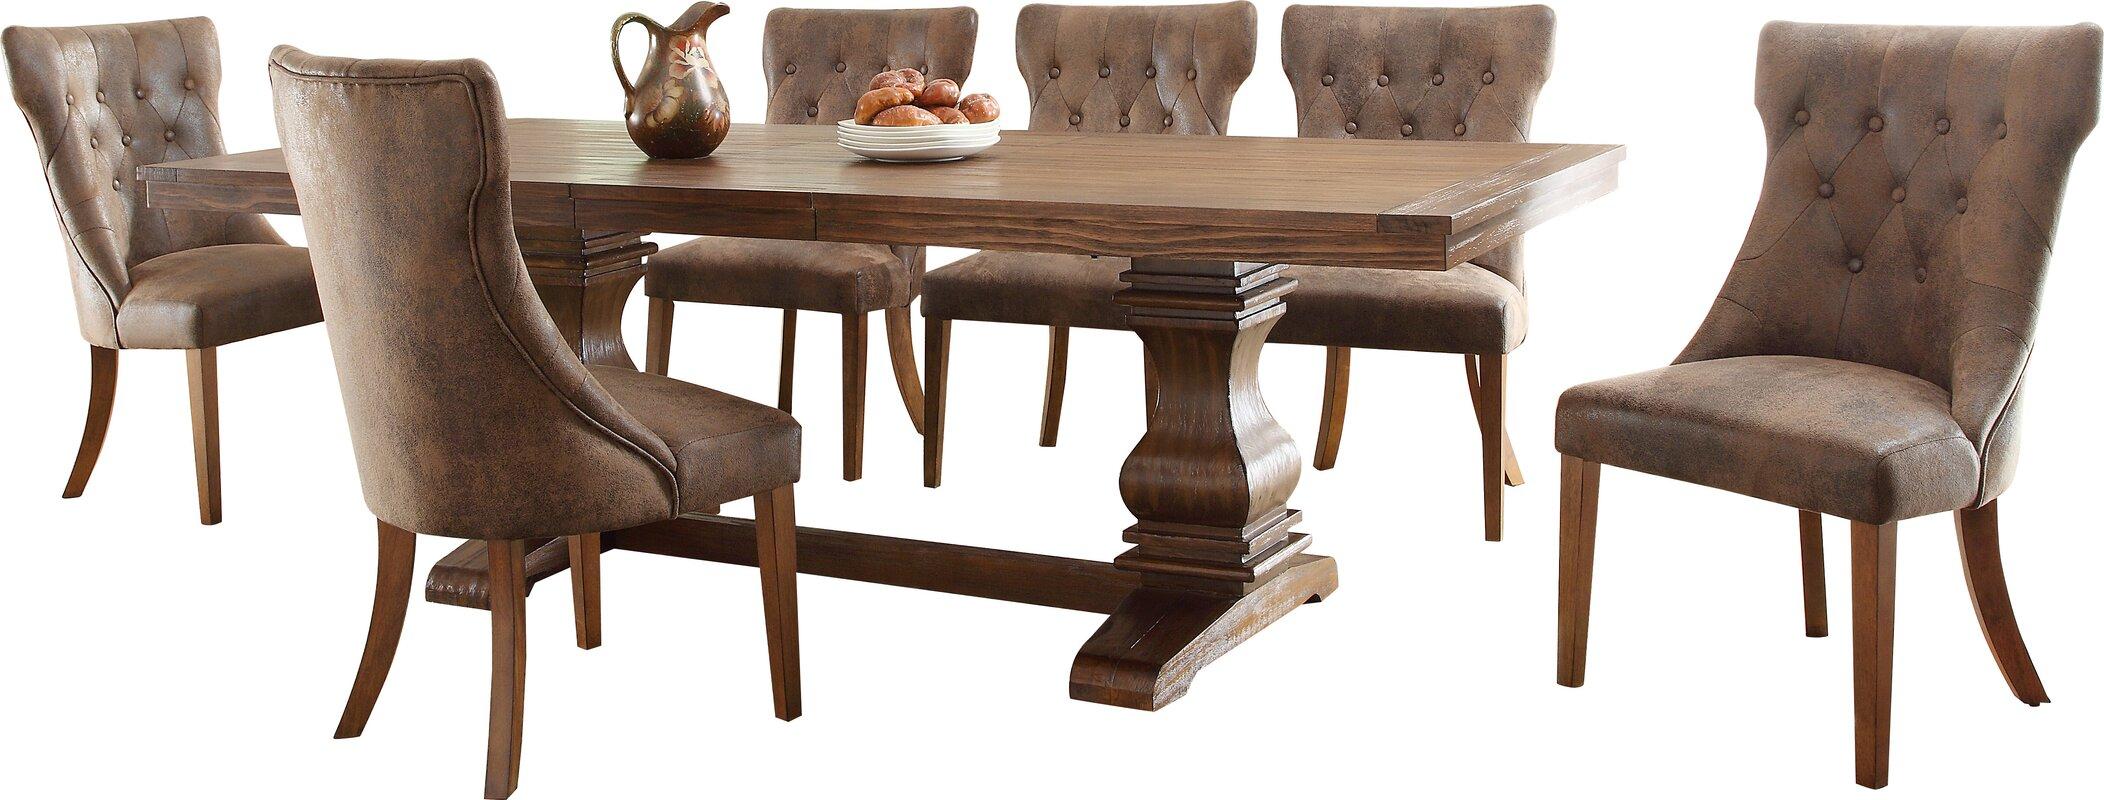 Dining Wood Table: Lark Manor Parfondeval Extendable Wood Dining Table